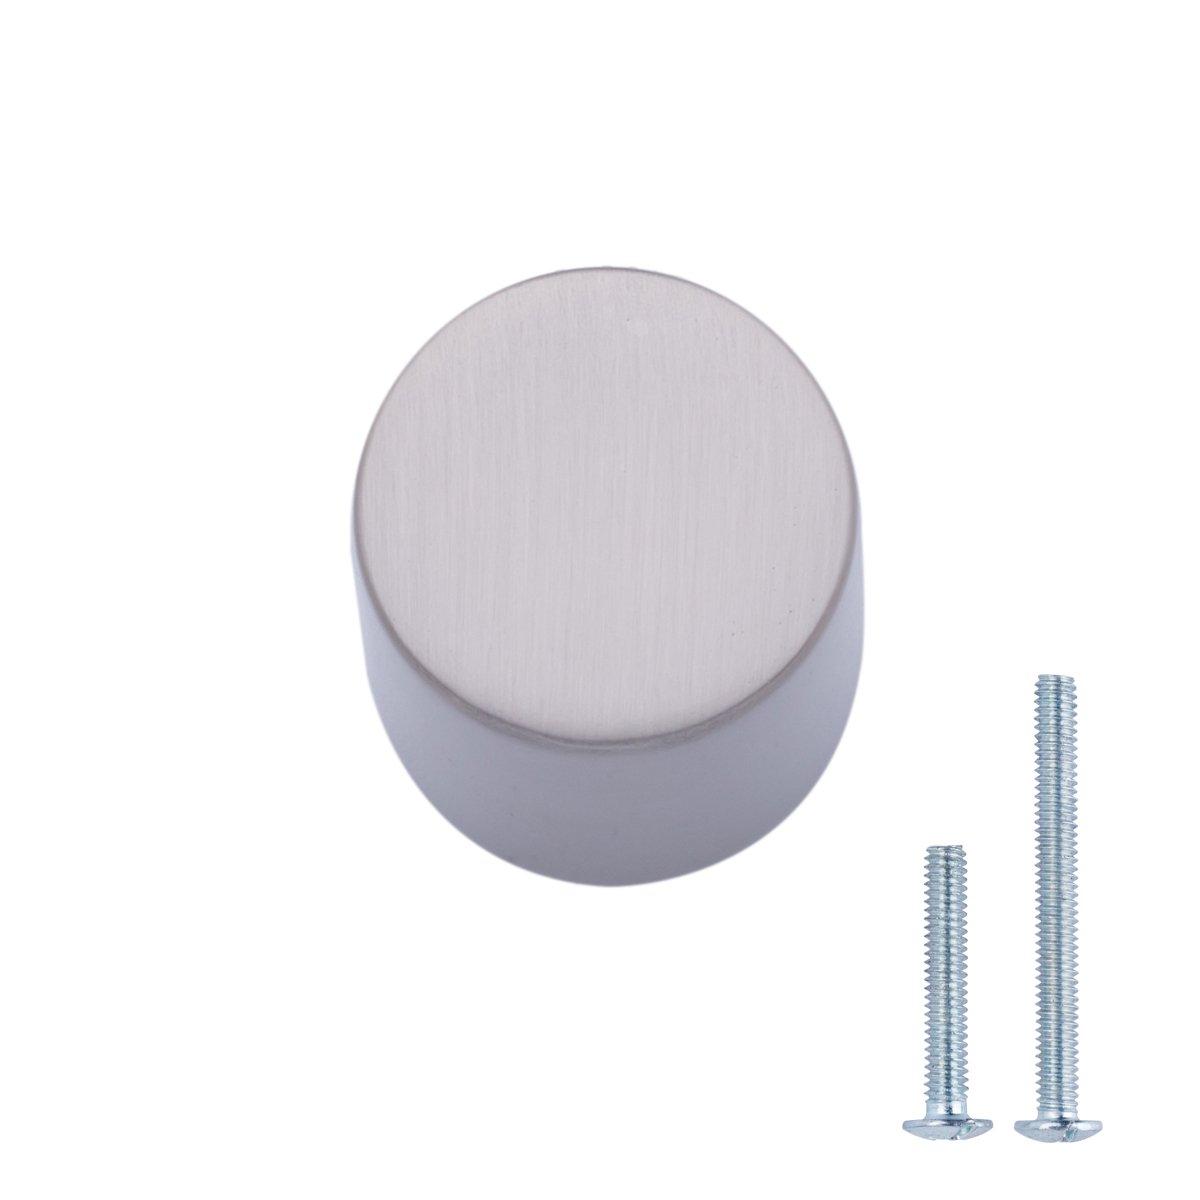 AmazonBasics Whistle Cabinet Knob, 0.75'' Diameter, Satin Nickel, 25-Pack